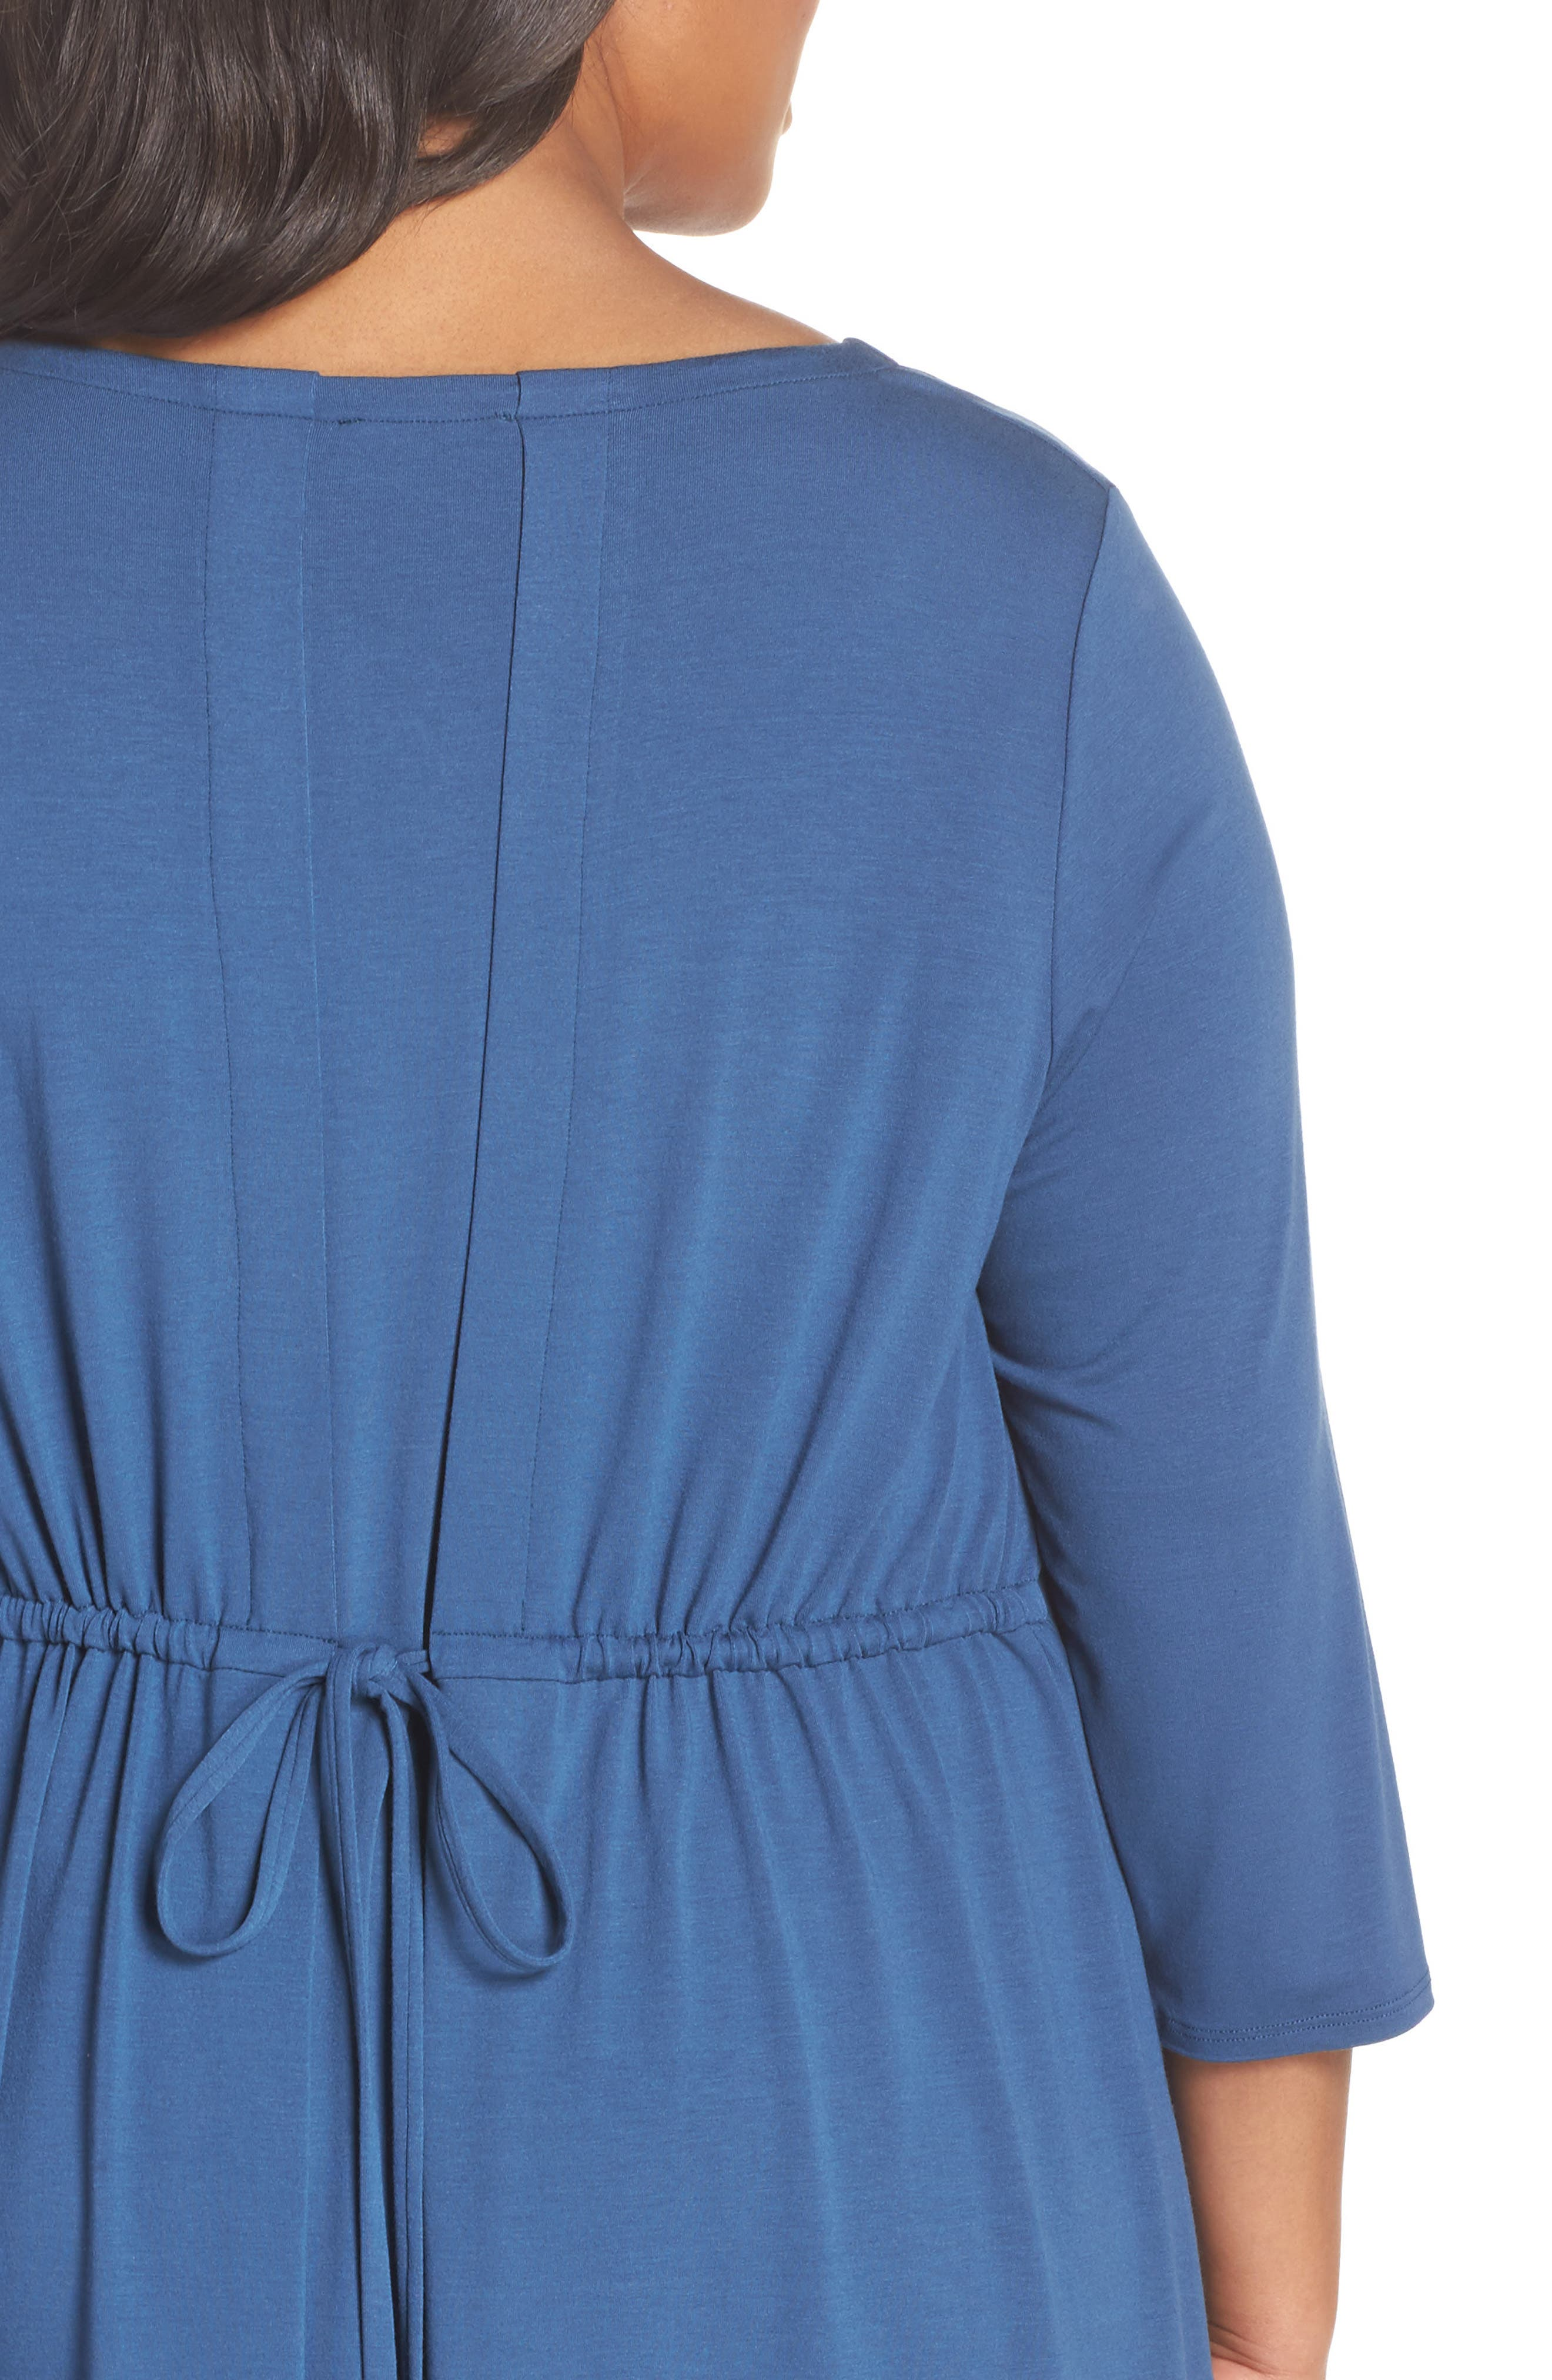 Jewel Neck Tie Back Dress,                             Alternate thumbnail 4, color,                             Denim